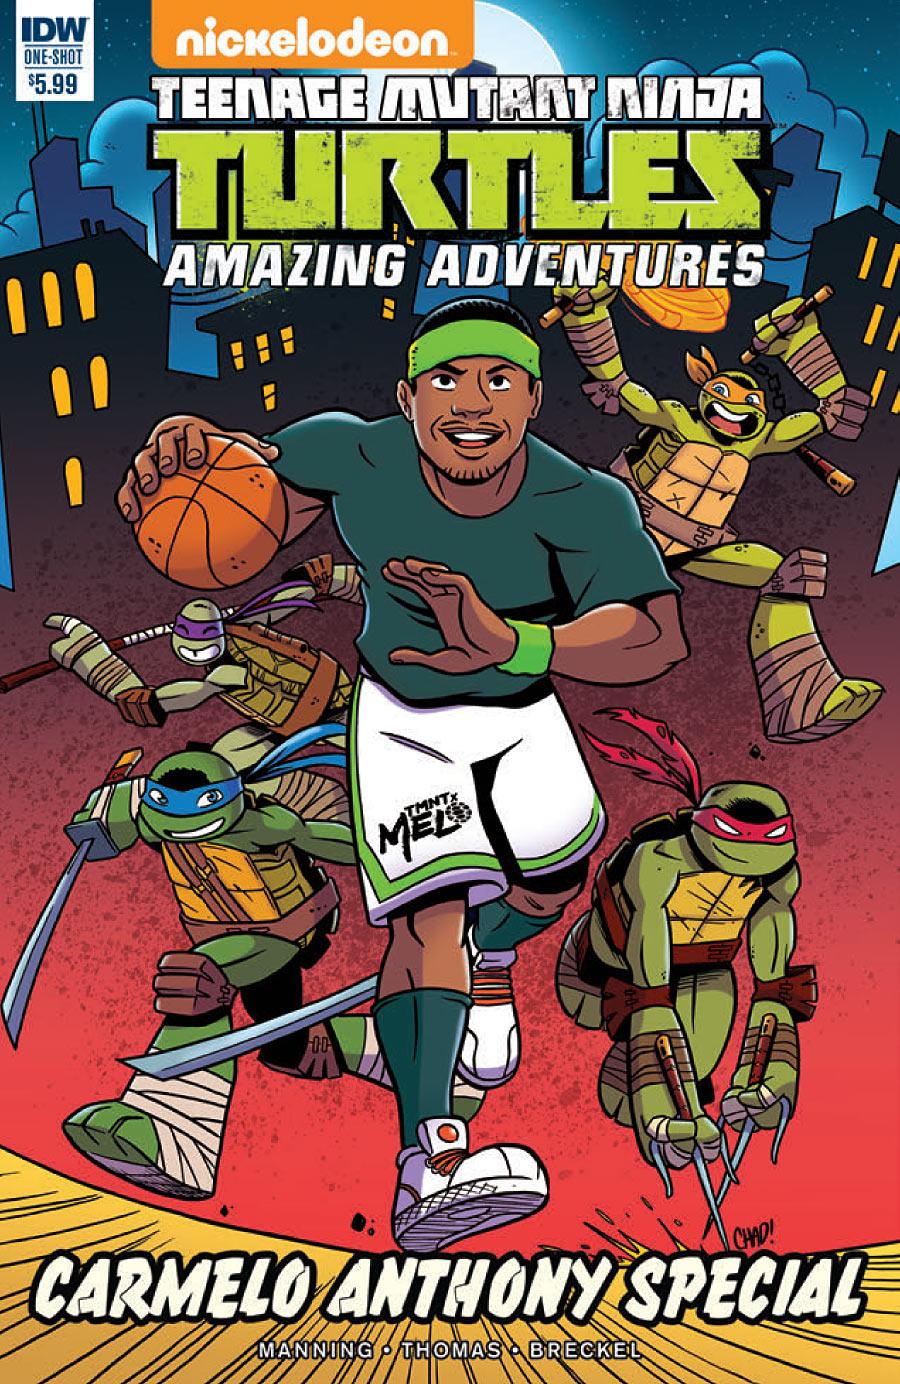 Teenage Mutant Ninja Turtles: Amazing Adventures: Carmelo Anthony Special #1